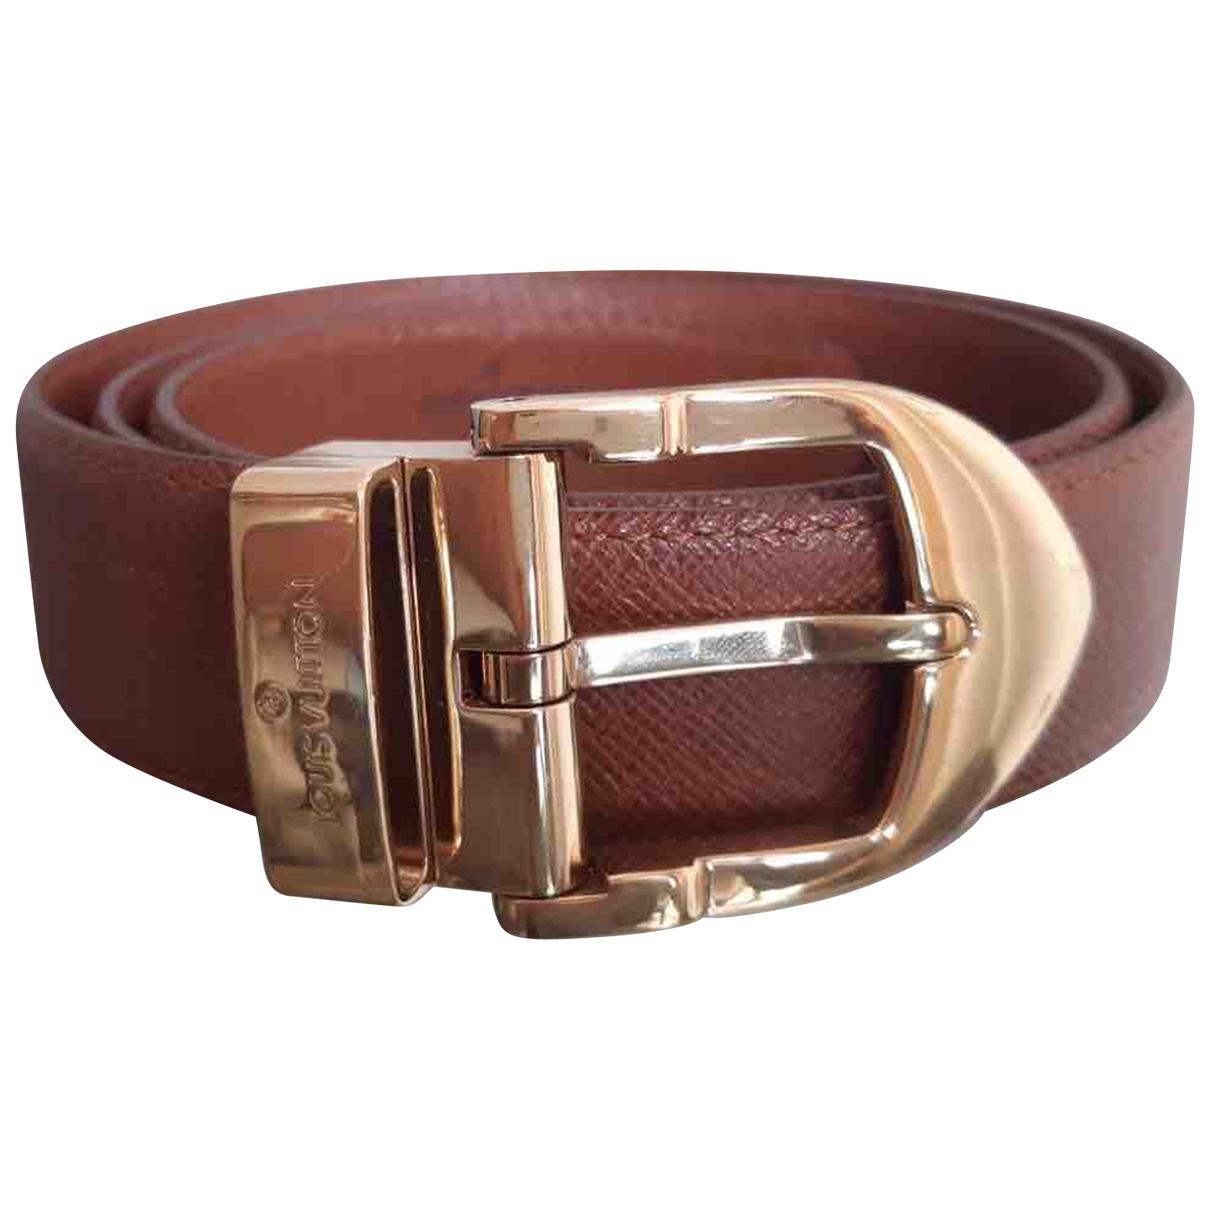 Louis Vuitton \N Brown Leather belt for Women 85 cm